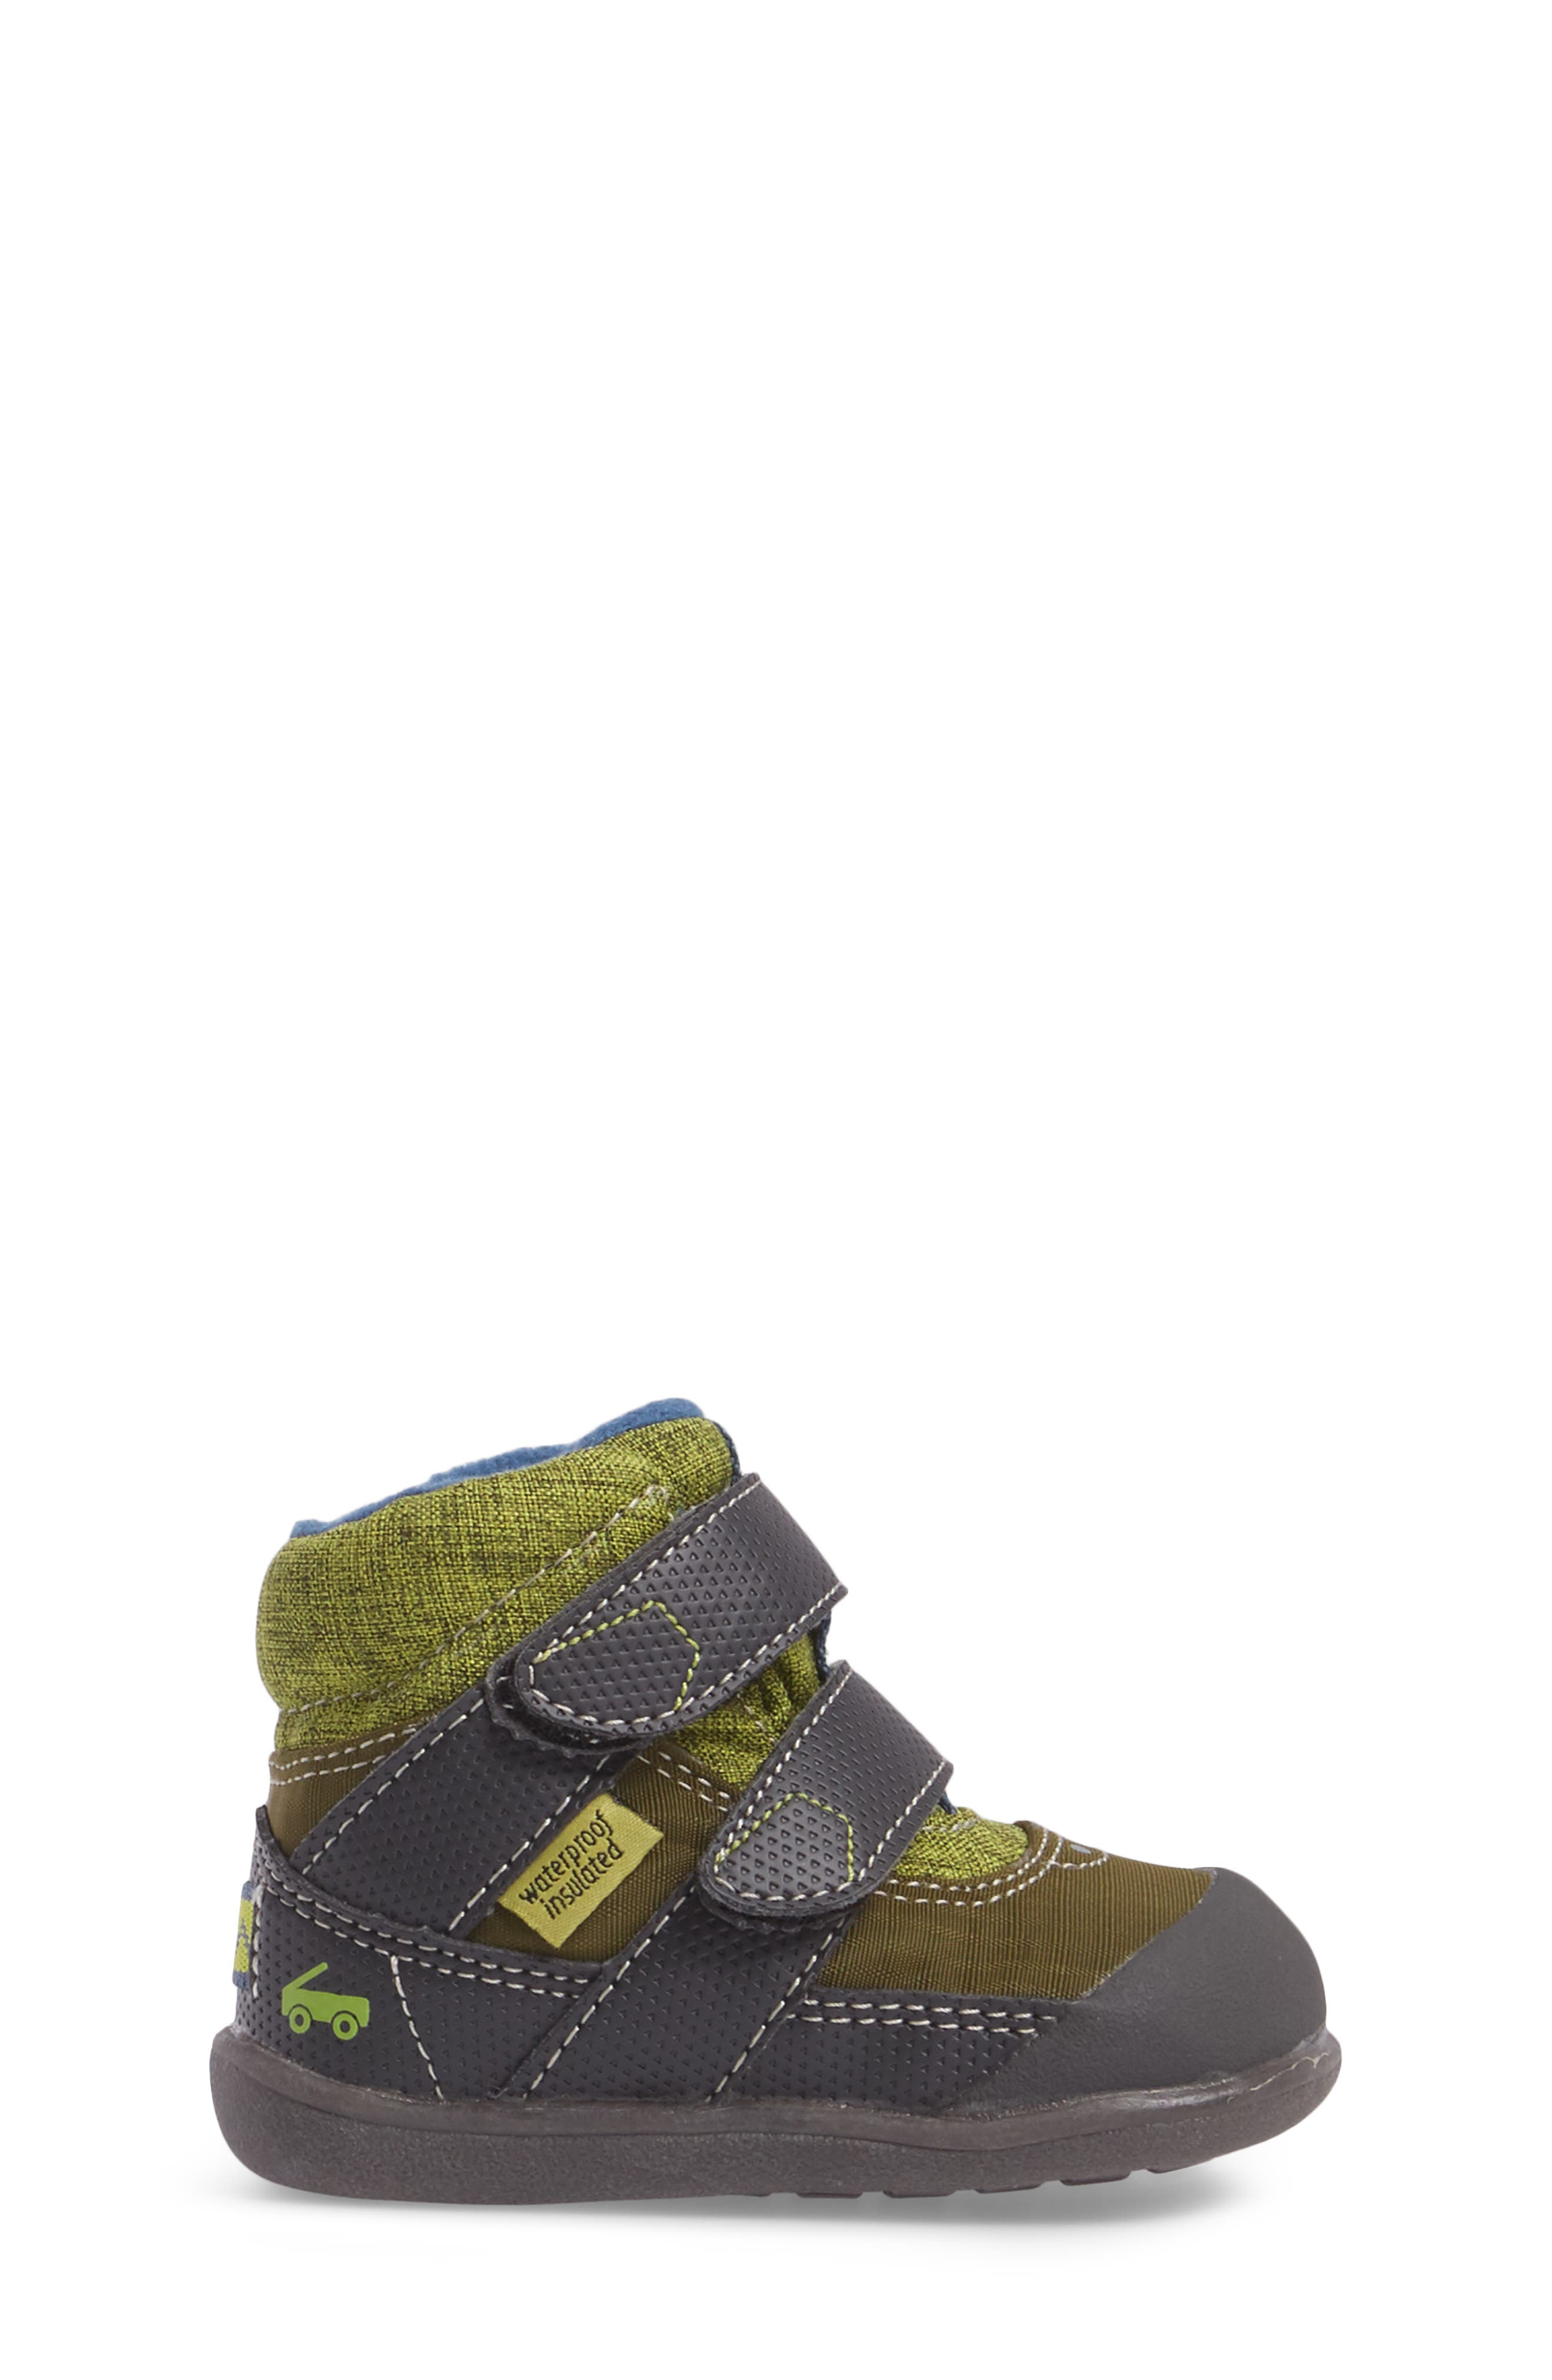 Atlas Waterproof Boot,                             Alternate thumbnail 3, color,                             Green